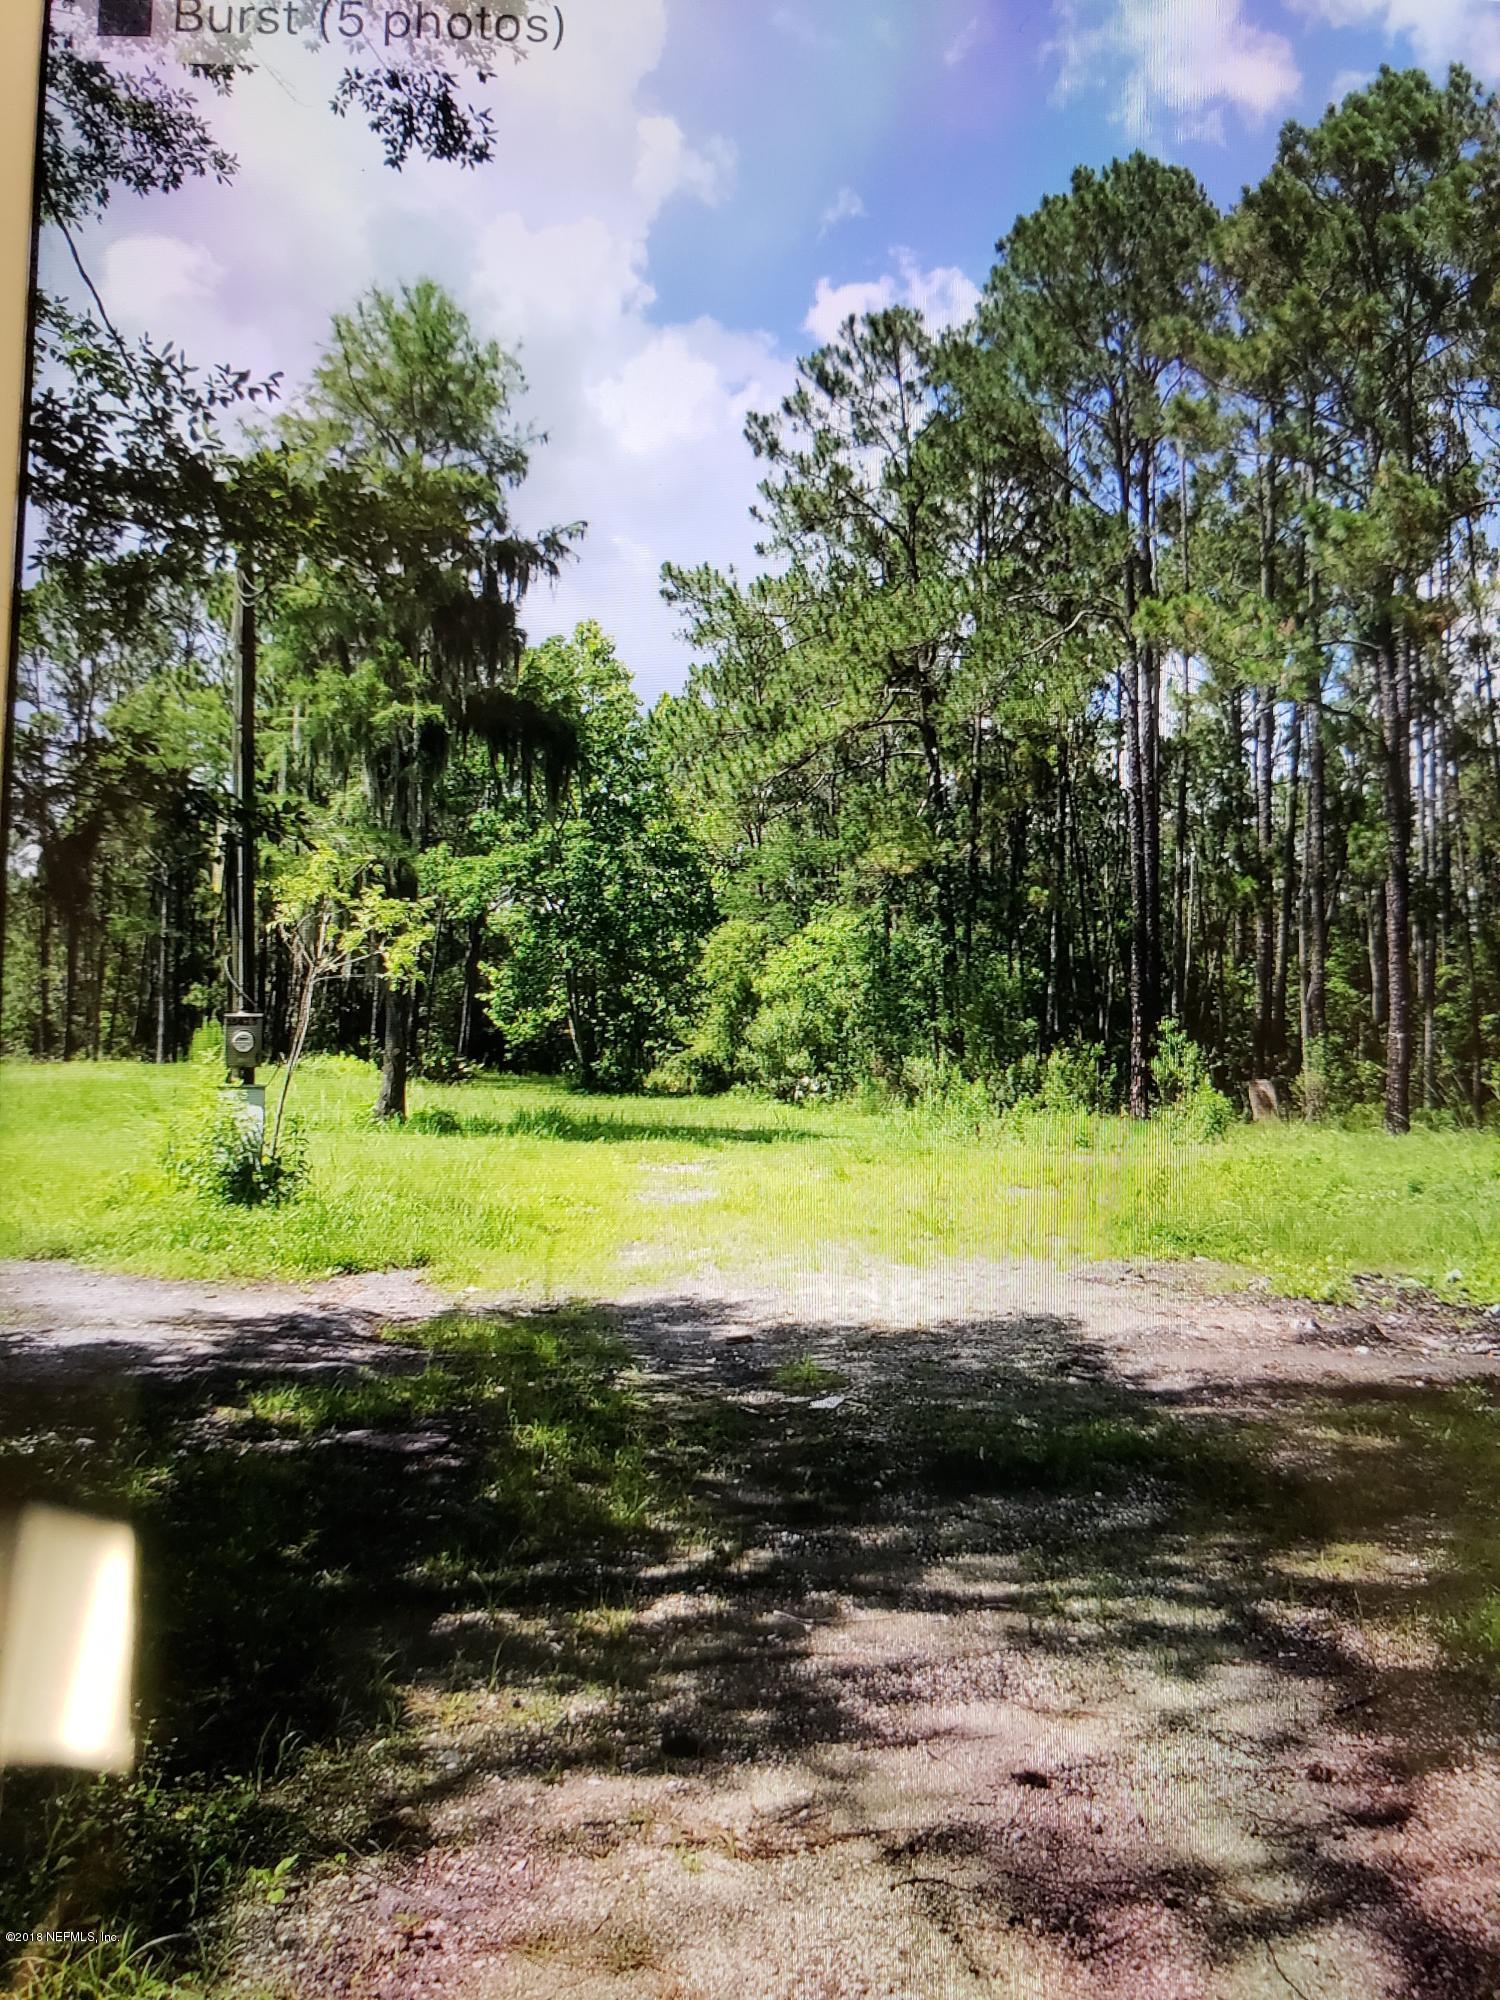 0 VILLAGE GREEN, JACKSONVILLE, FLORIDA 32234, ,Vacant land,For sale,VILLAGE GREEN,968888